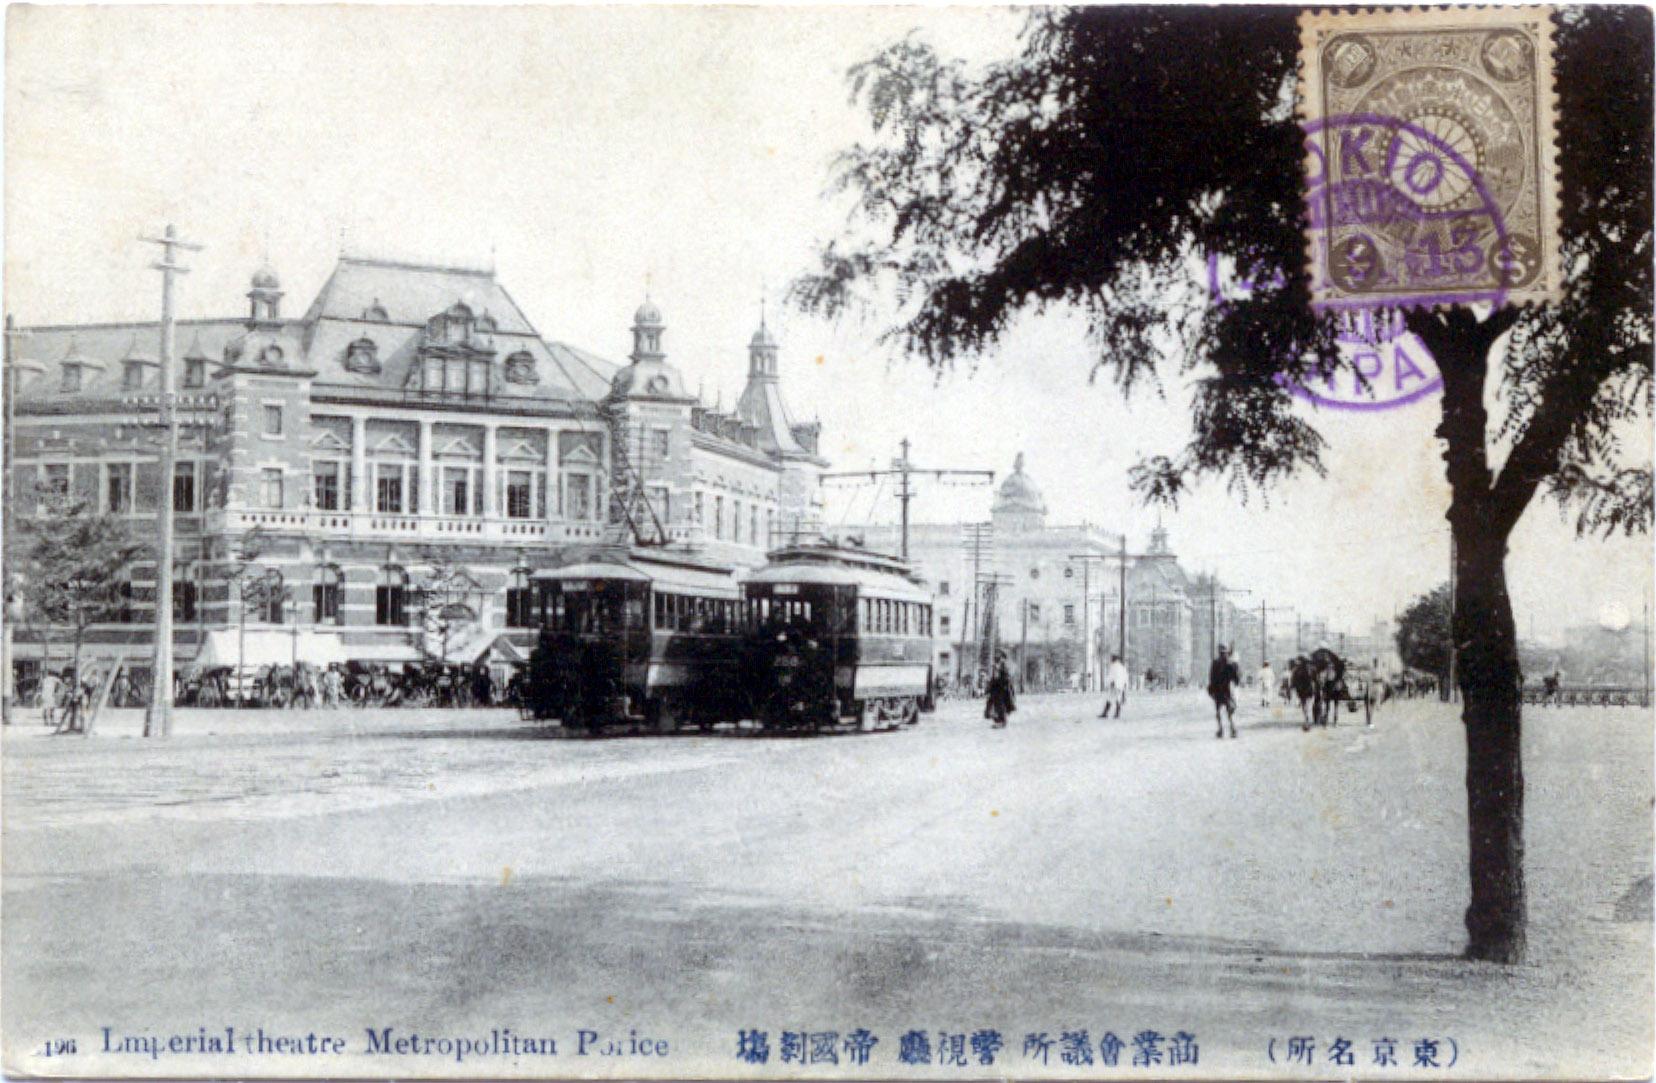 babasaki-metro-police-imperial-theatre.jpg